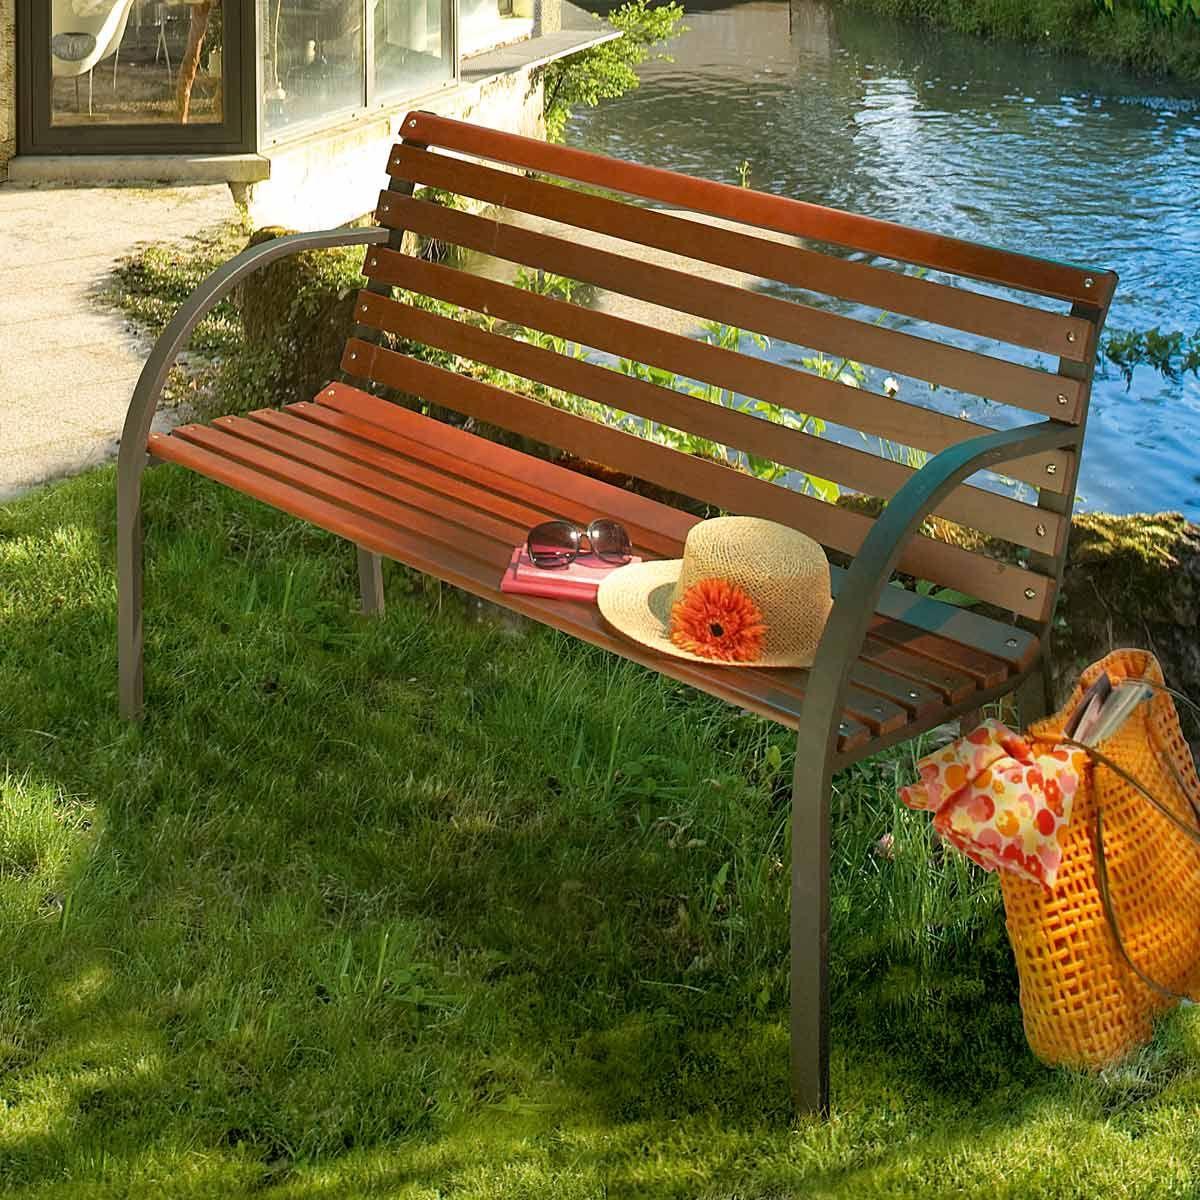 Mobilier jardin hesperide best of banc de jardin marron - Mobilier jardin hesperide ...